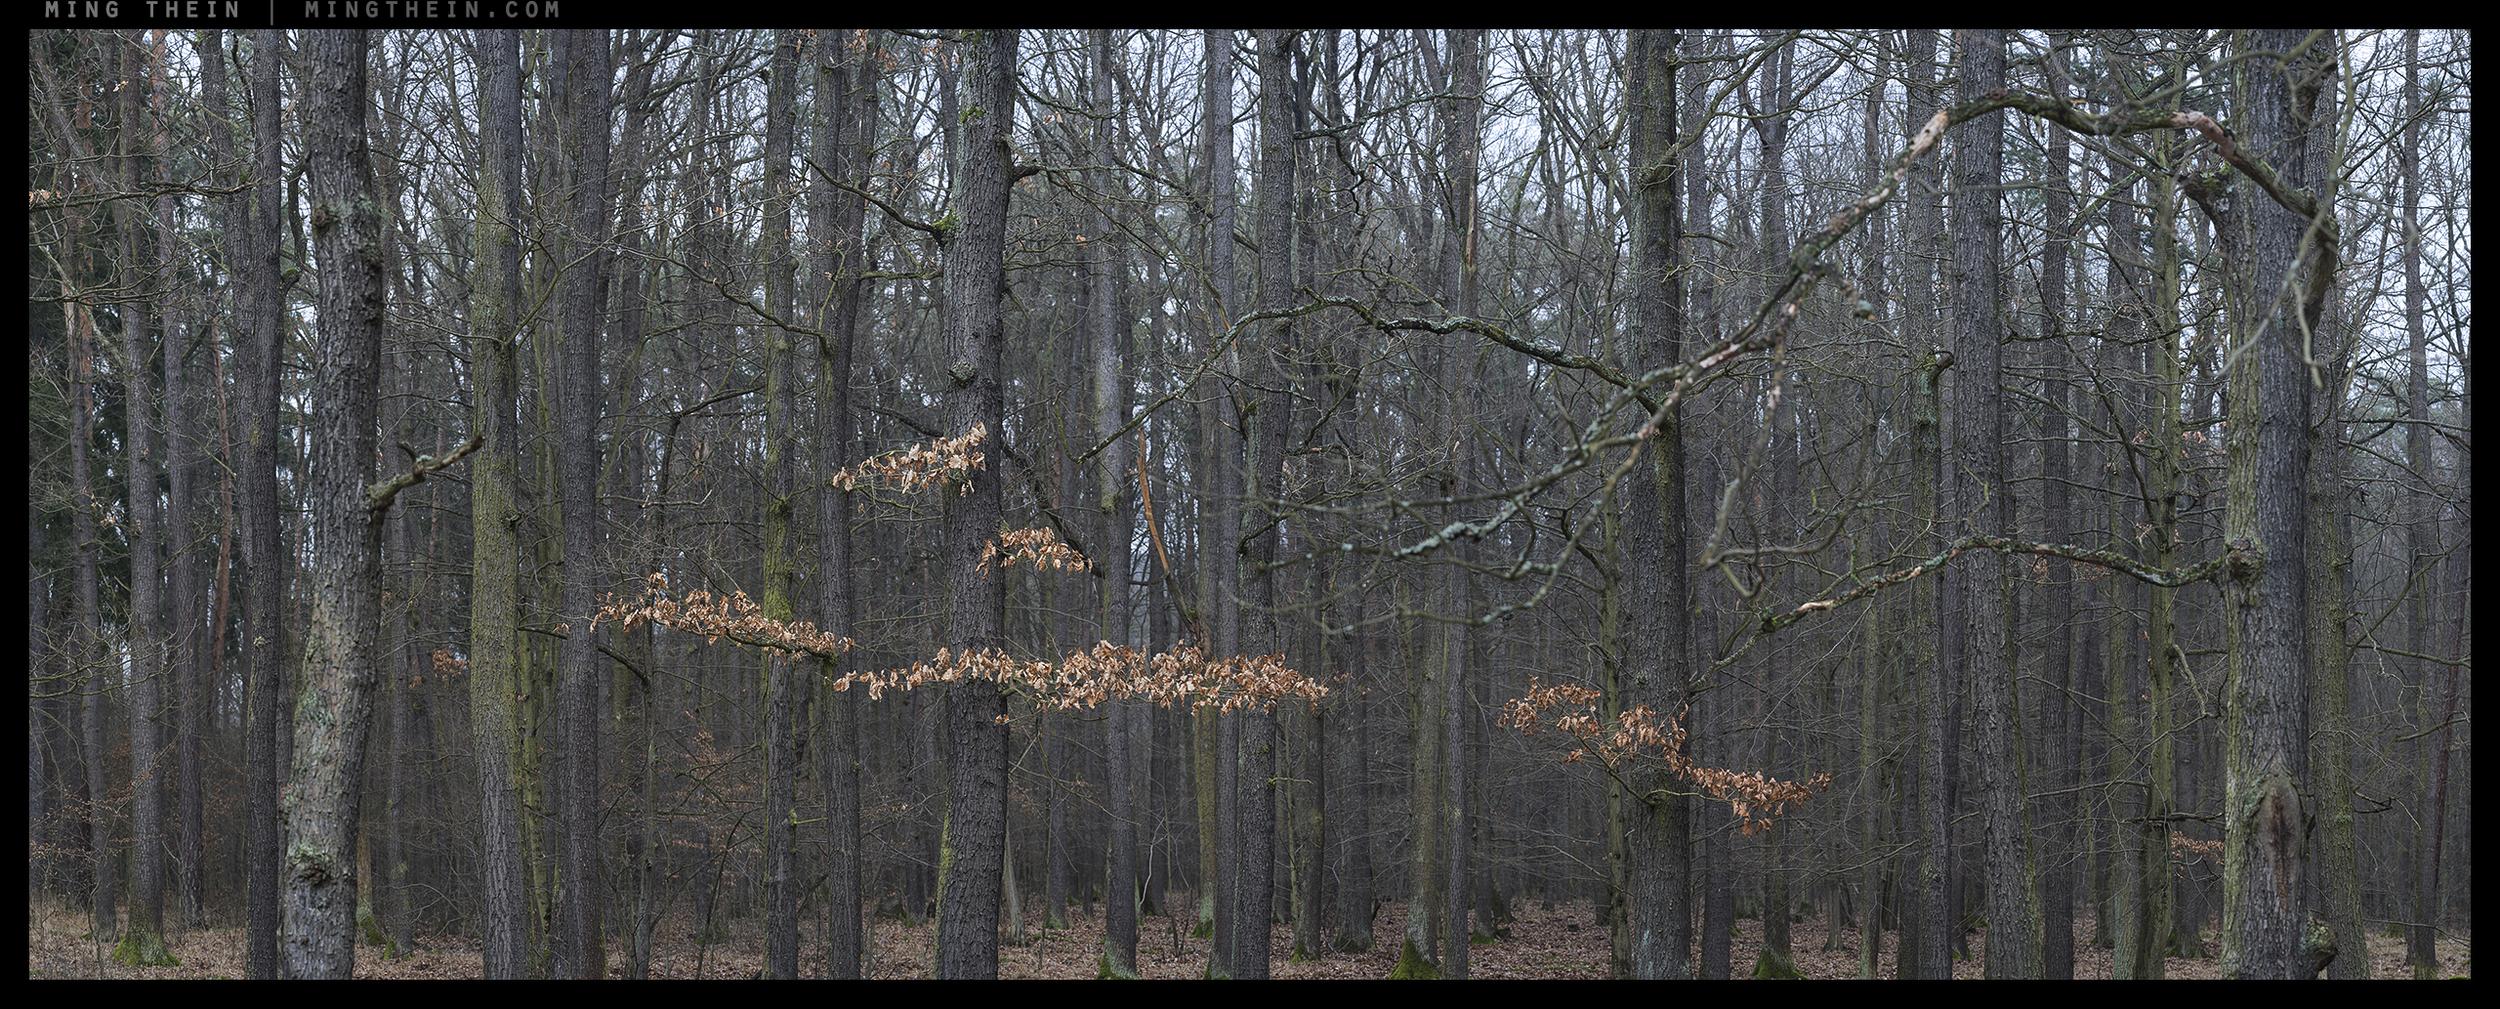 _8B18698__8B18723 15k forest XXVI.jpg